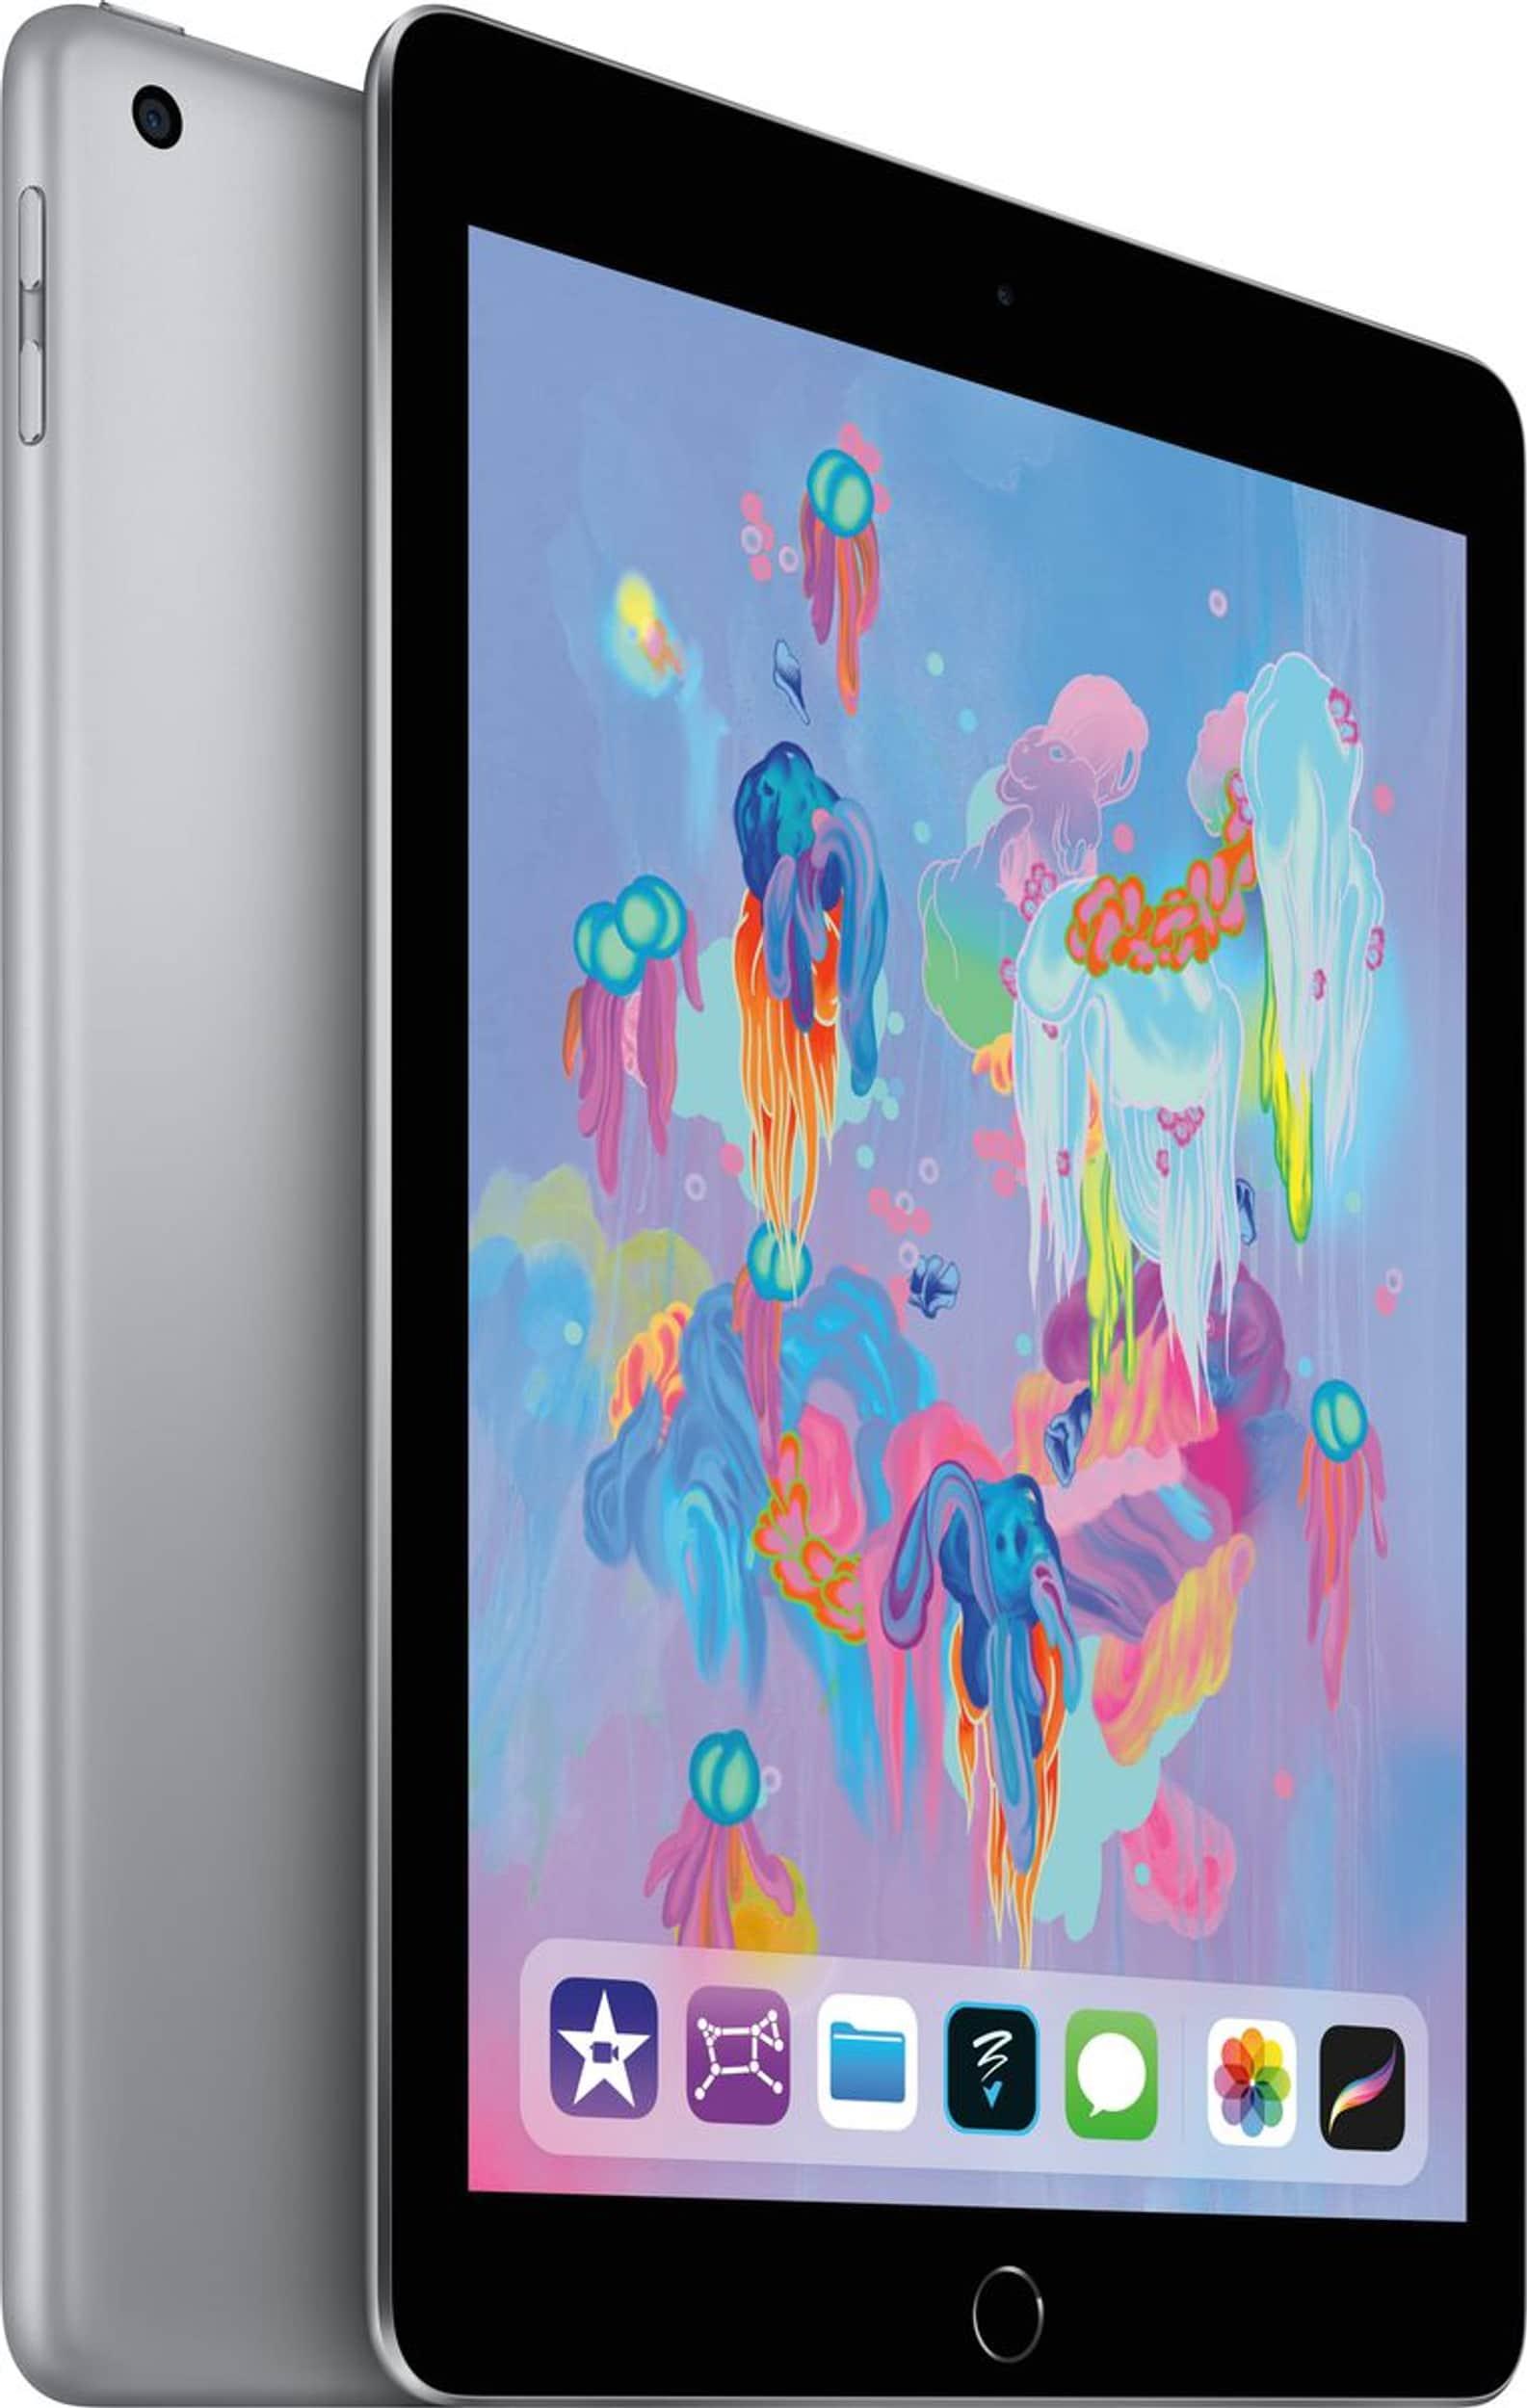 APPLE iPad 2018 128 GB Wifi alle Farben für 291,75 € bei [meletronics CH]